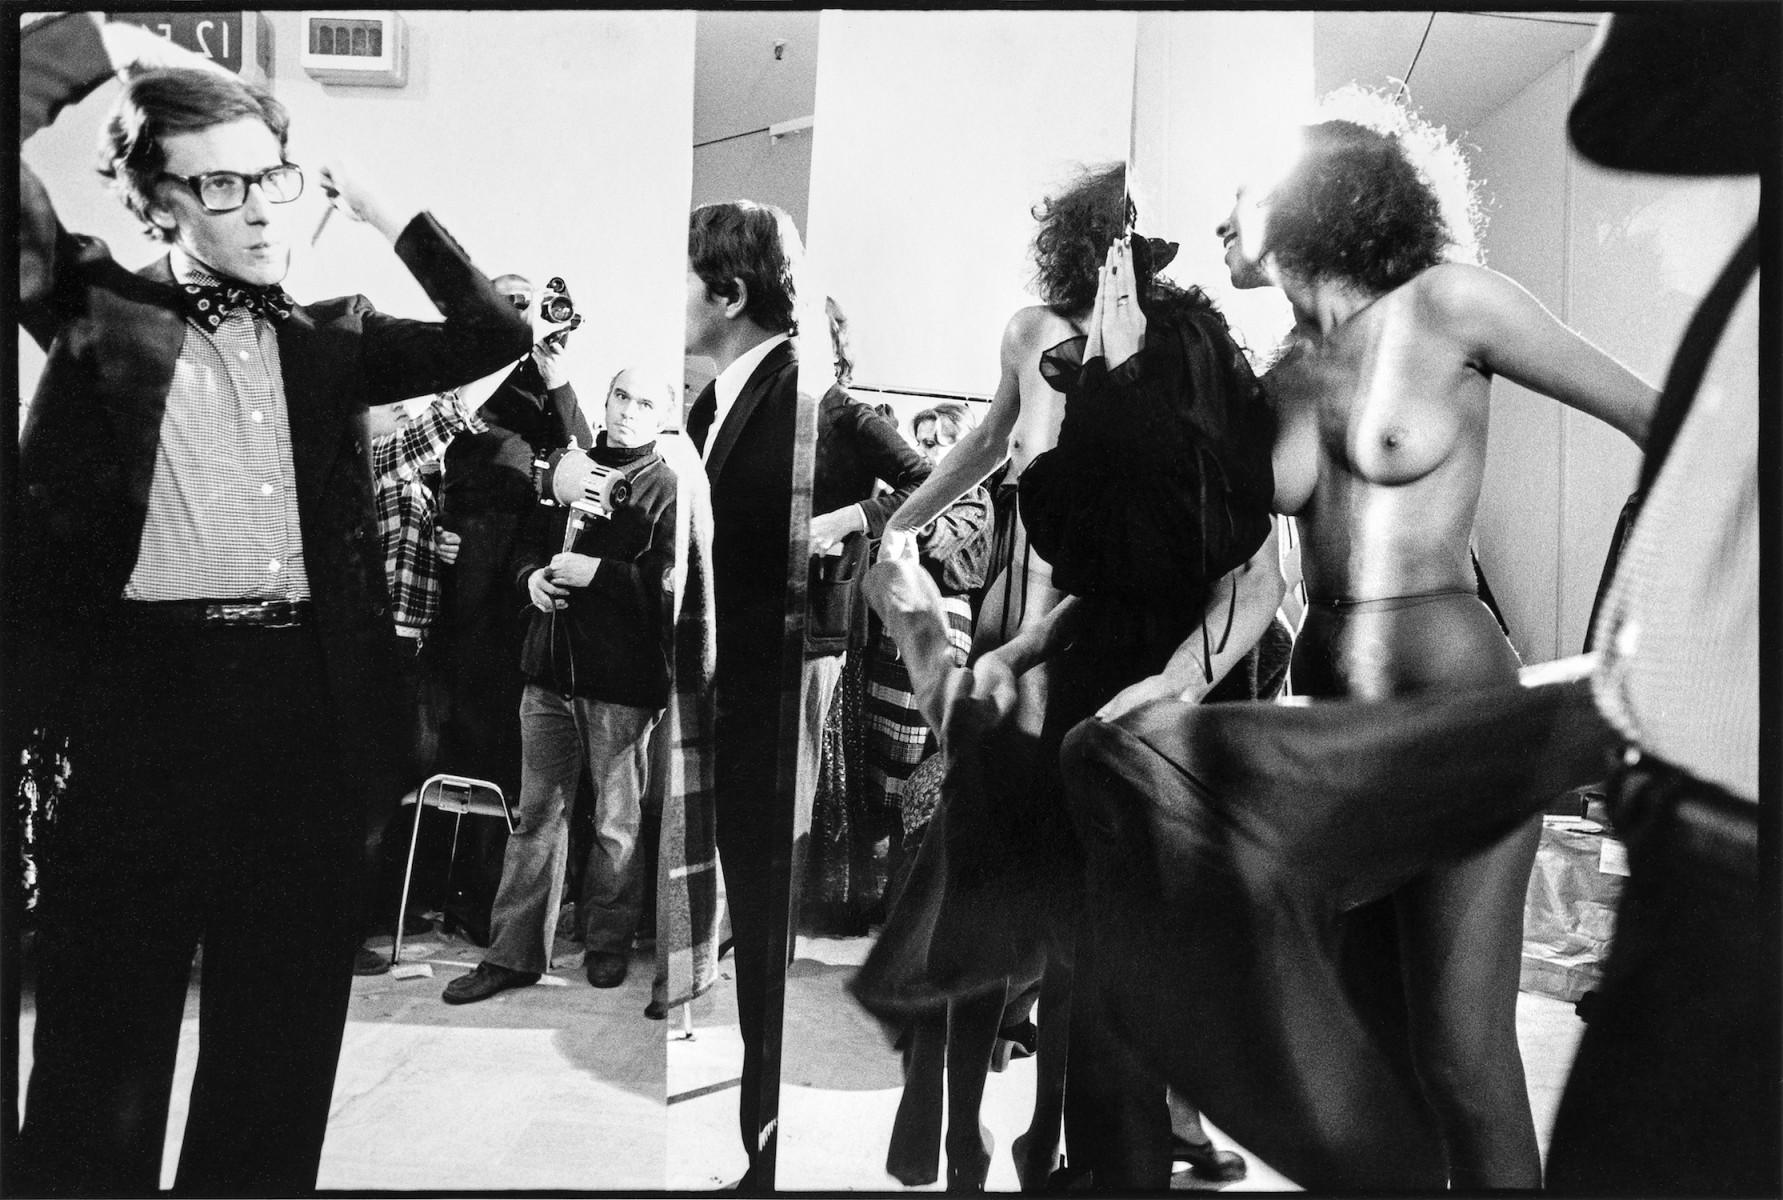 Yves Saint Laurent in a Mirror, Paris 1977